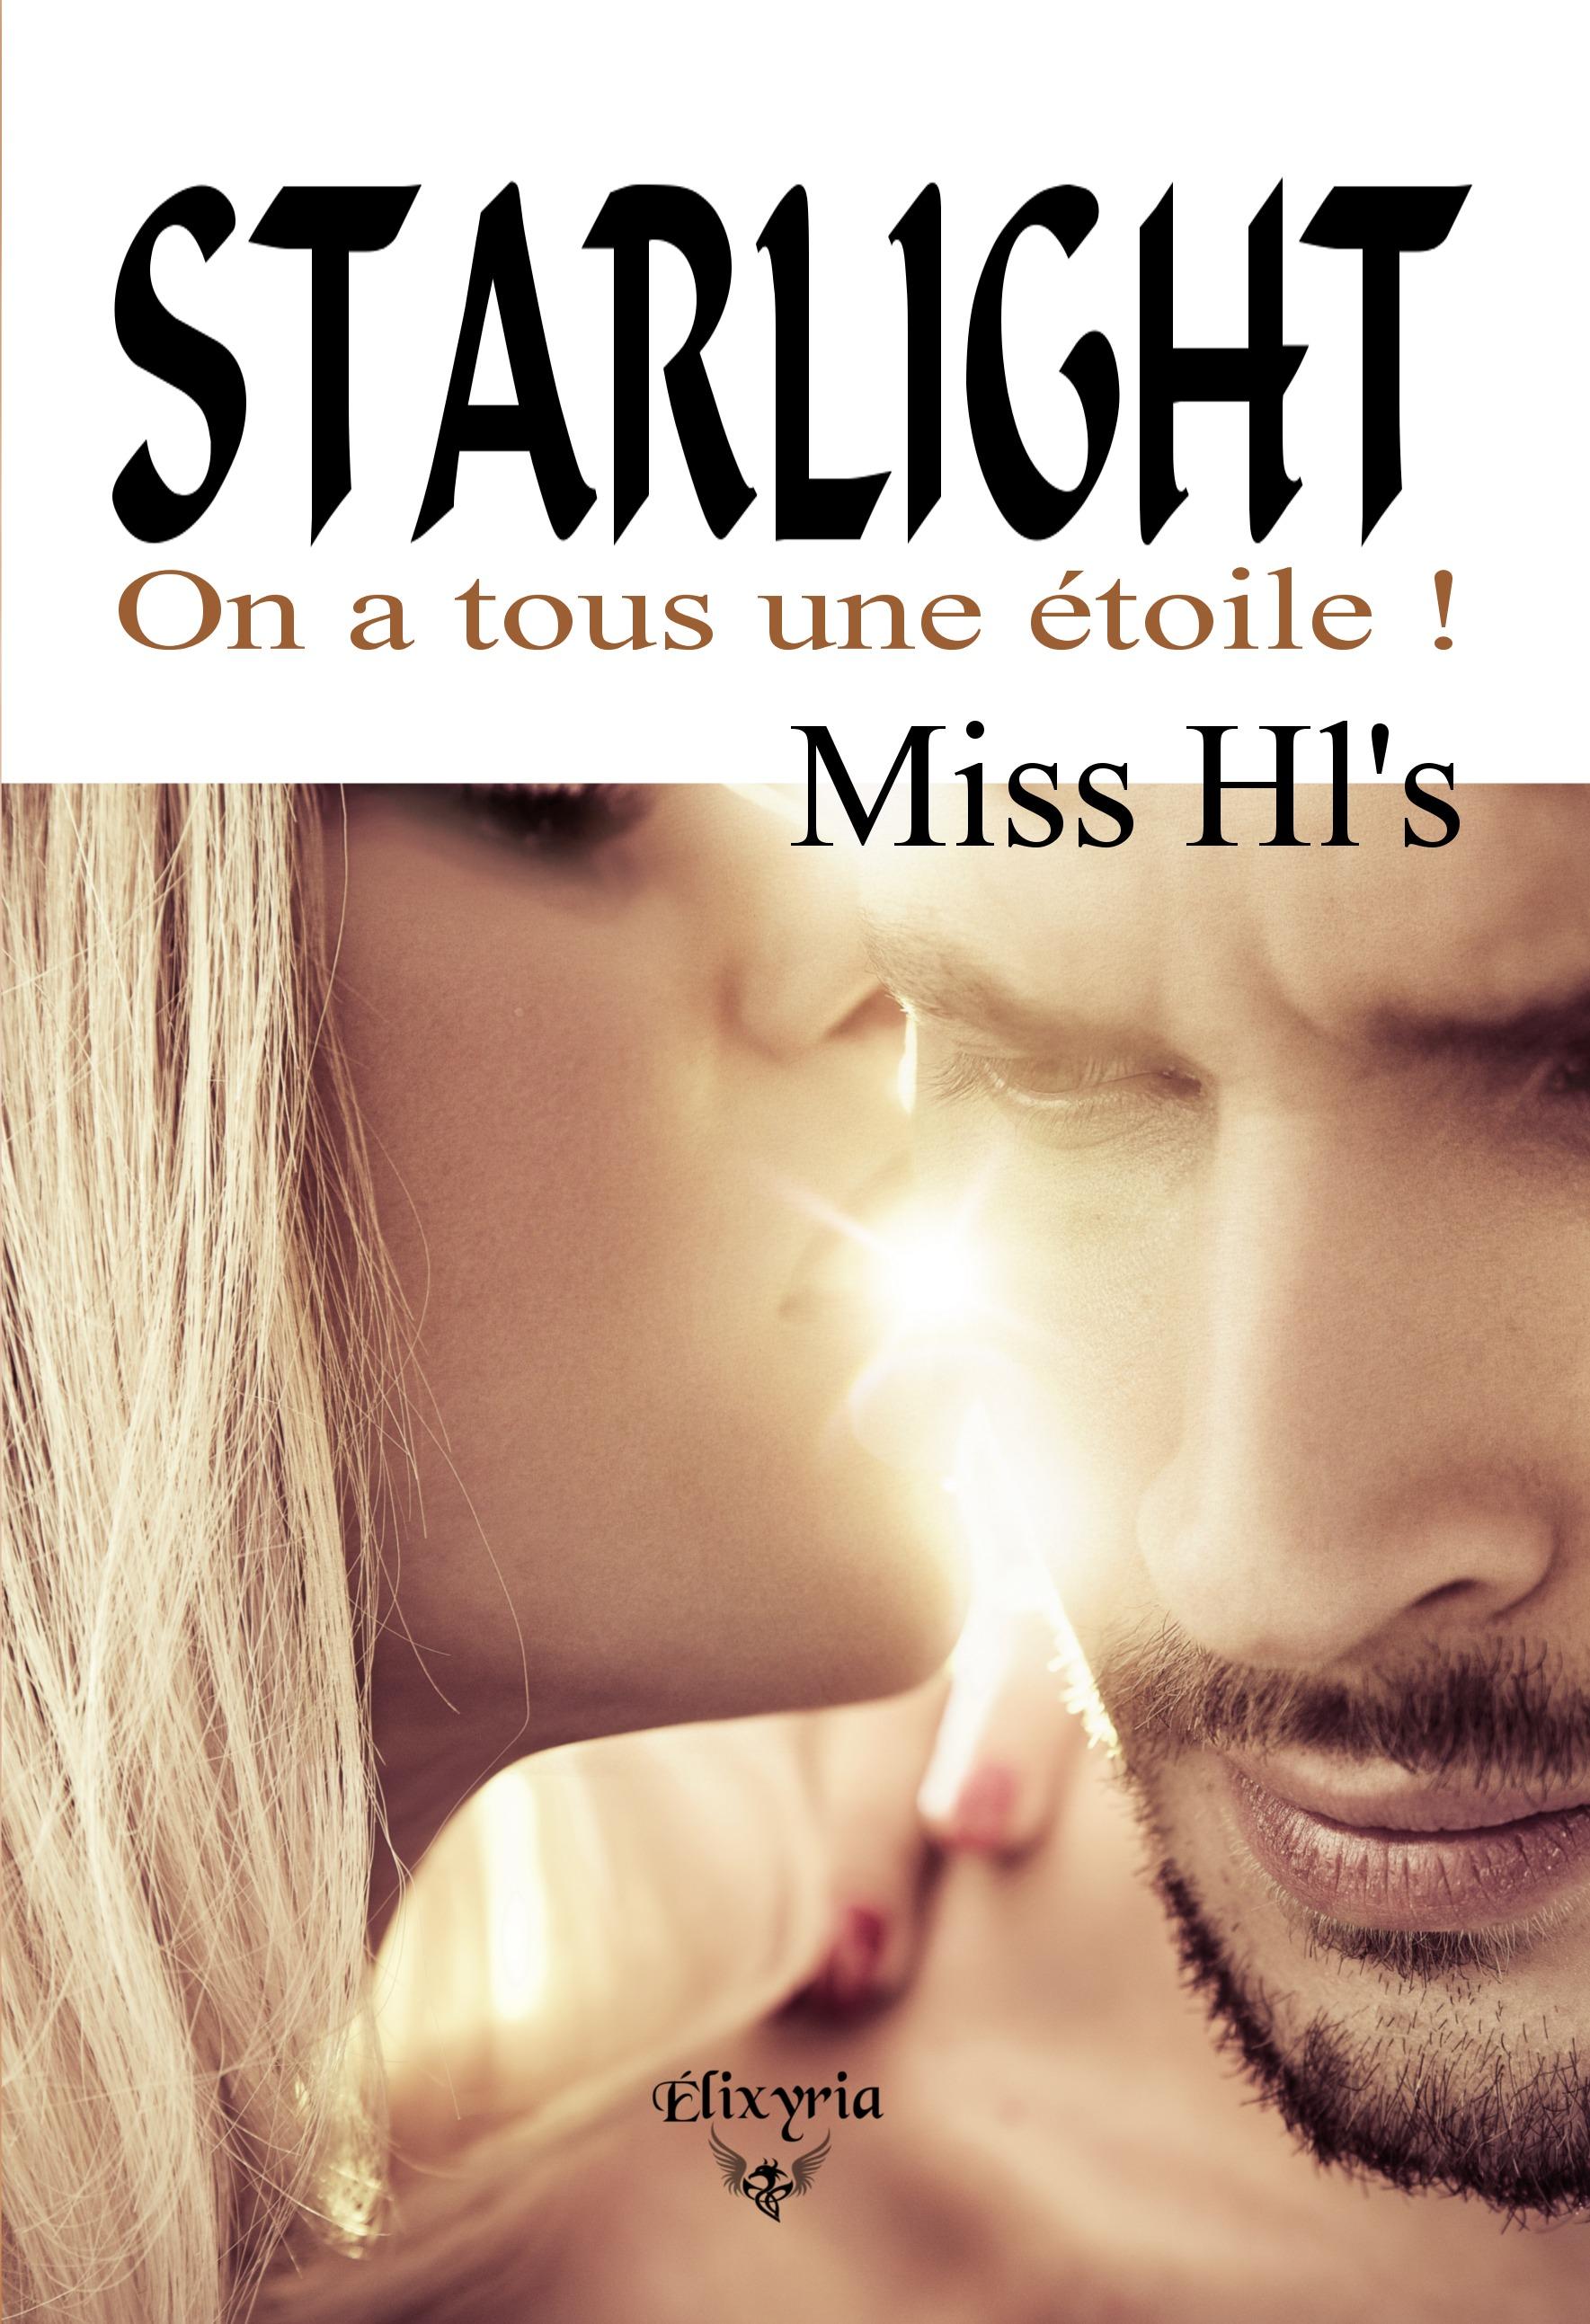 Starlight, ON A TOUS UNE ÉTOILE !